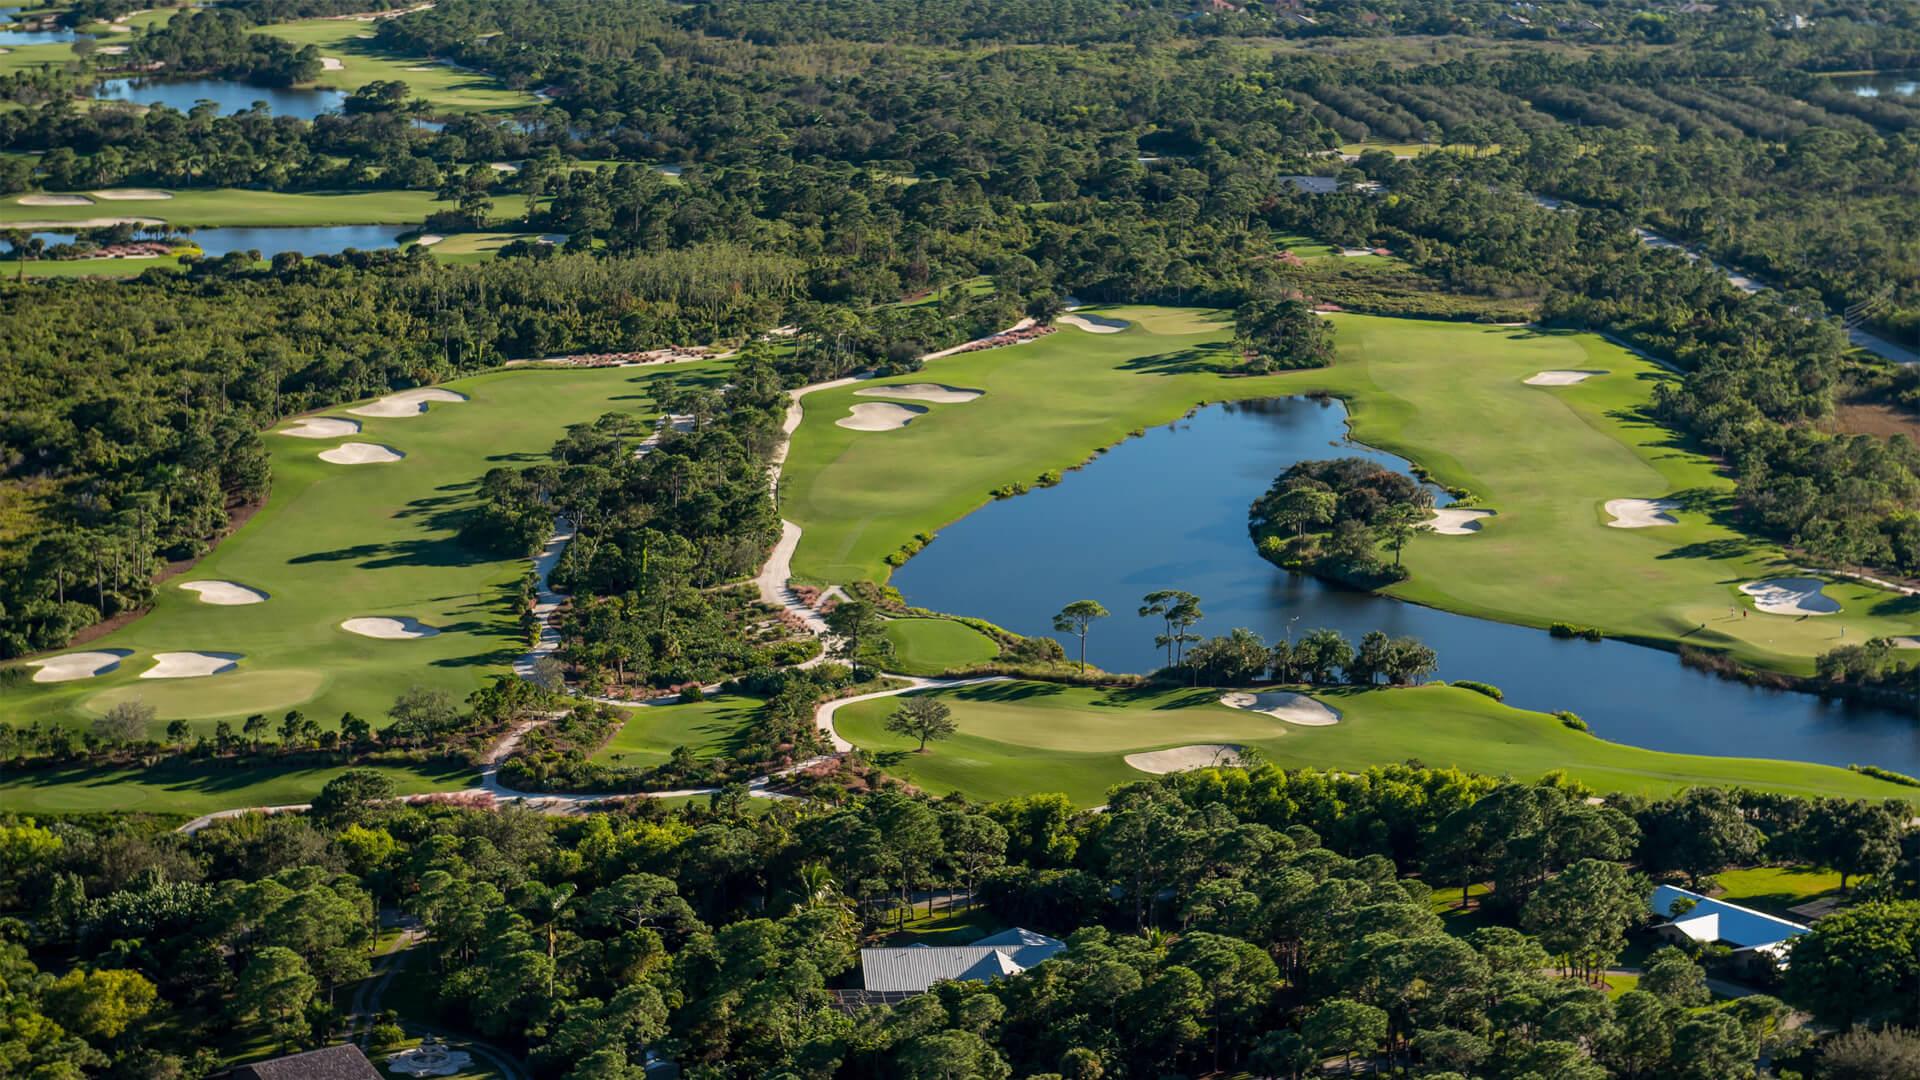 The Floridian Course  Floridian National Golf Club